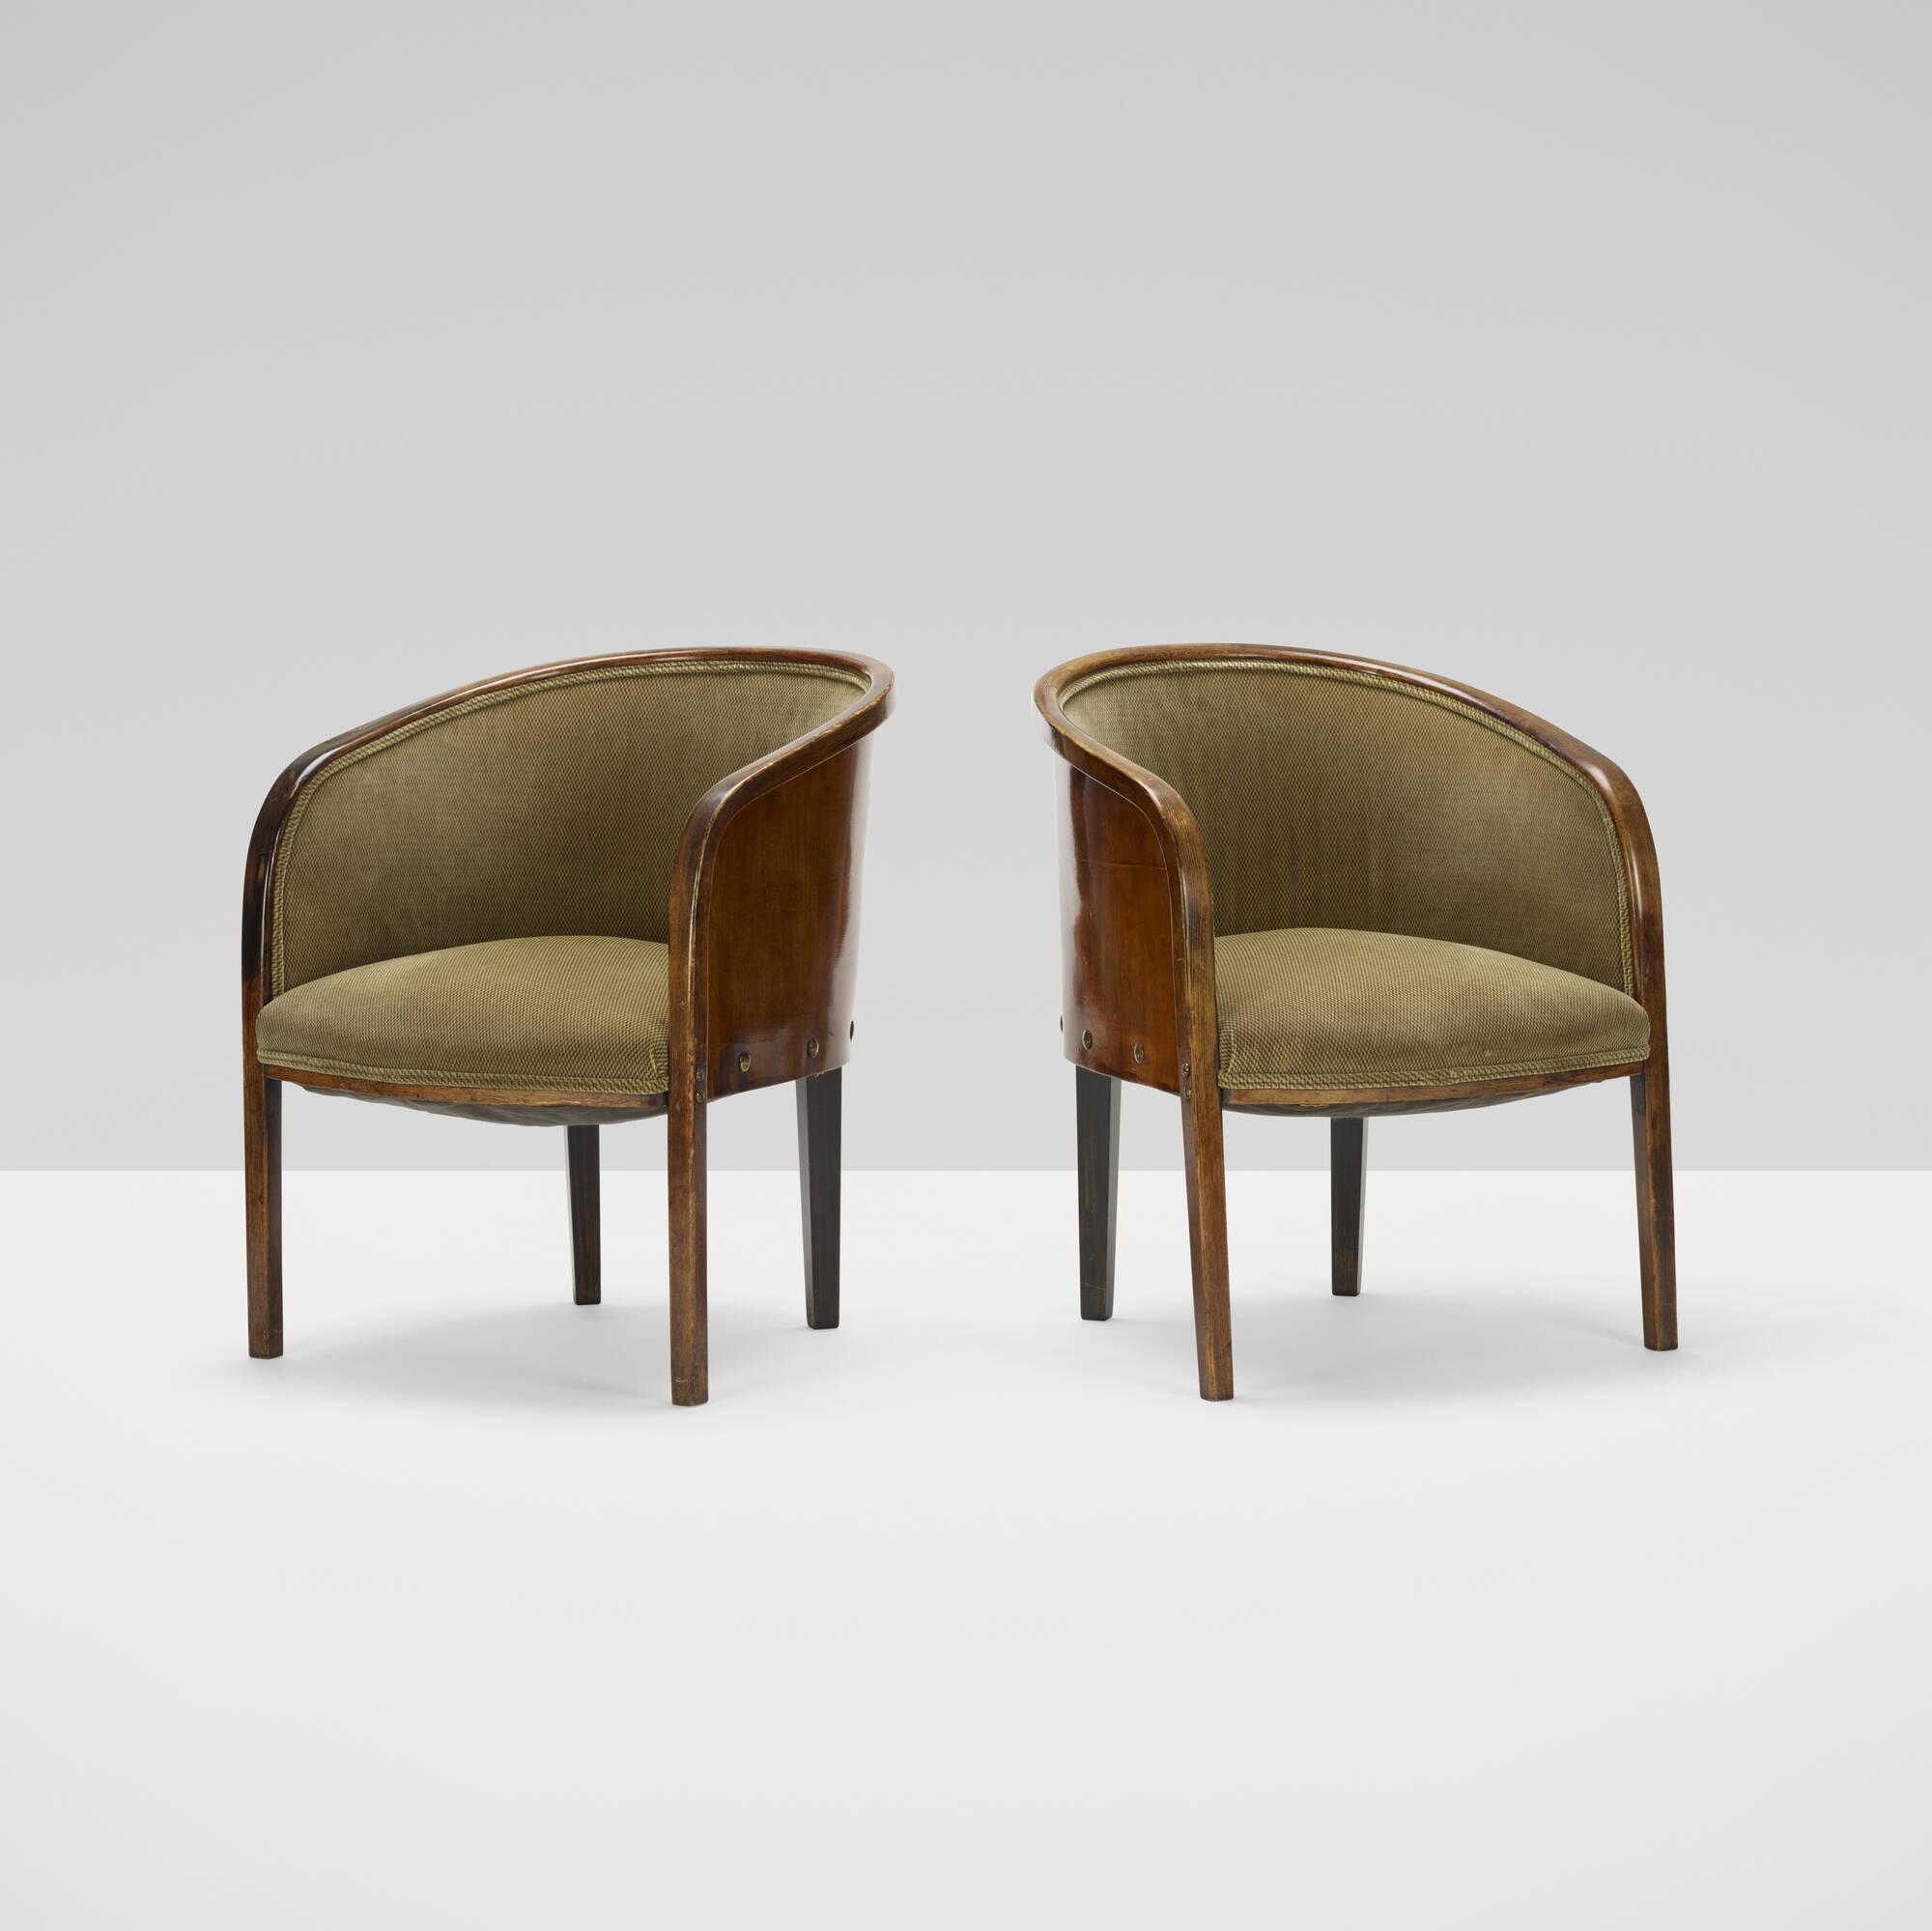 160: J. & J. Kohn / armchairs model W795, pair (2 of 3)